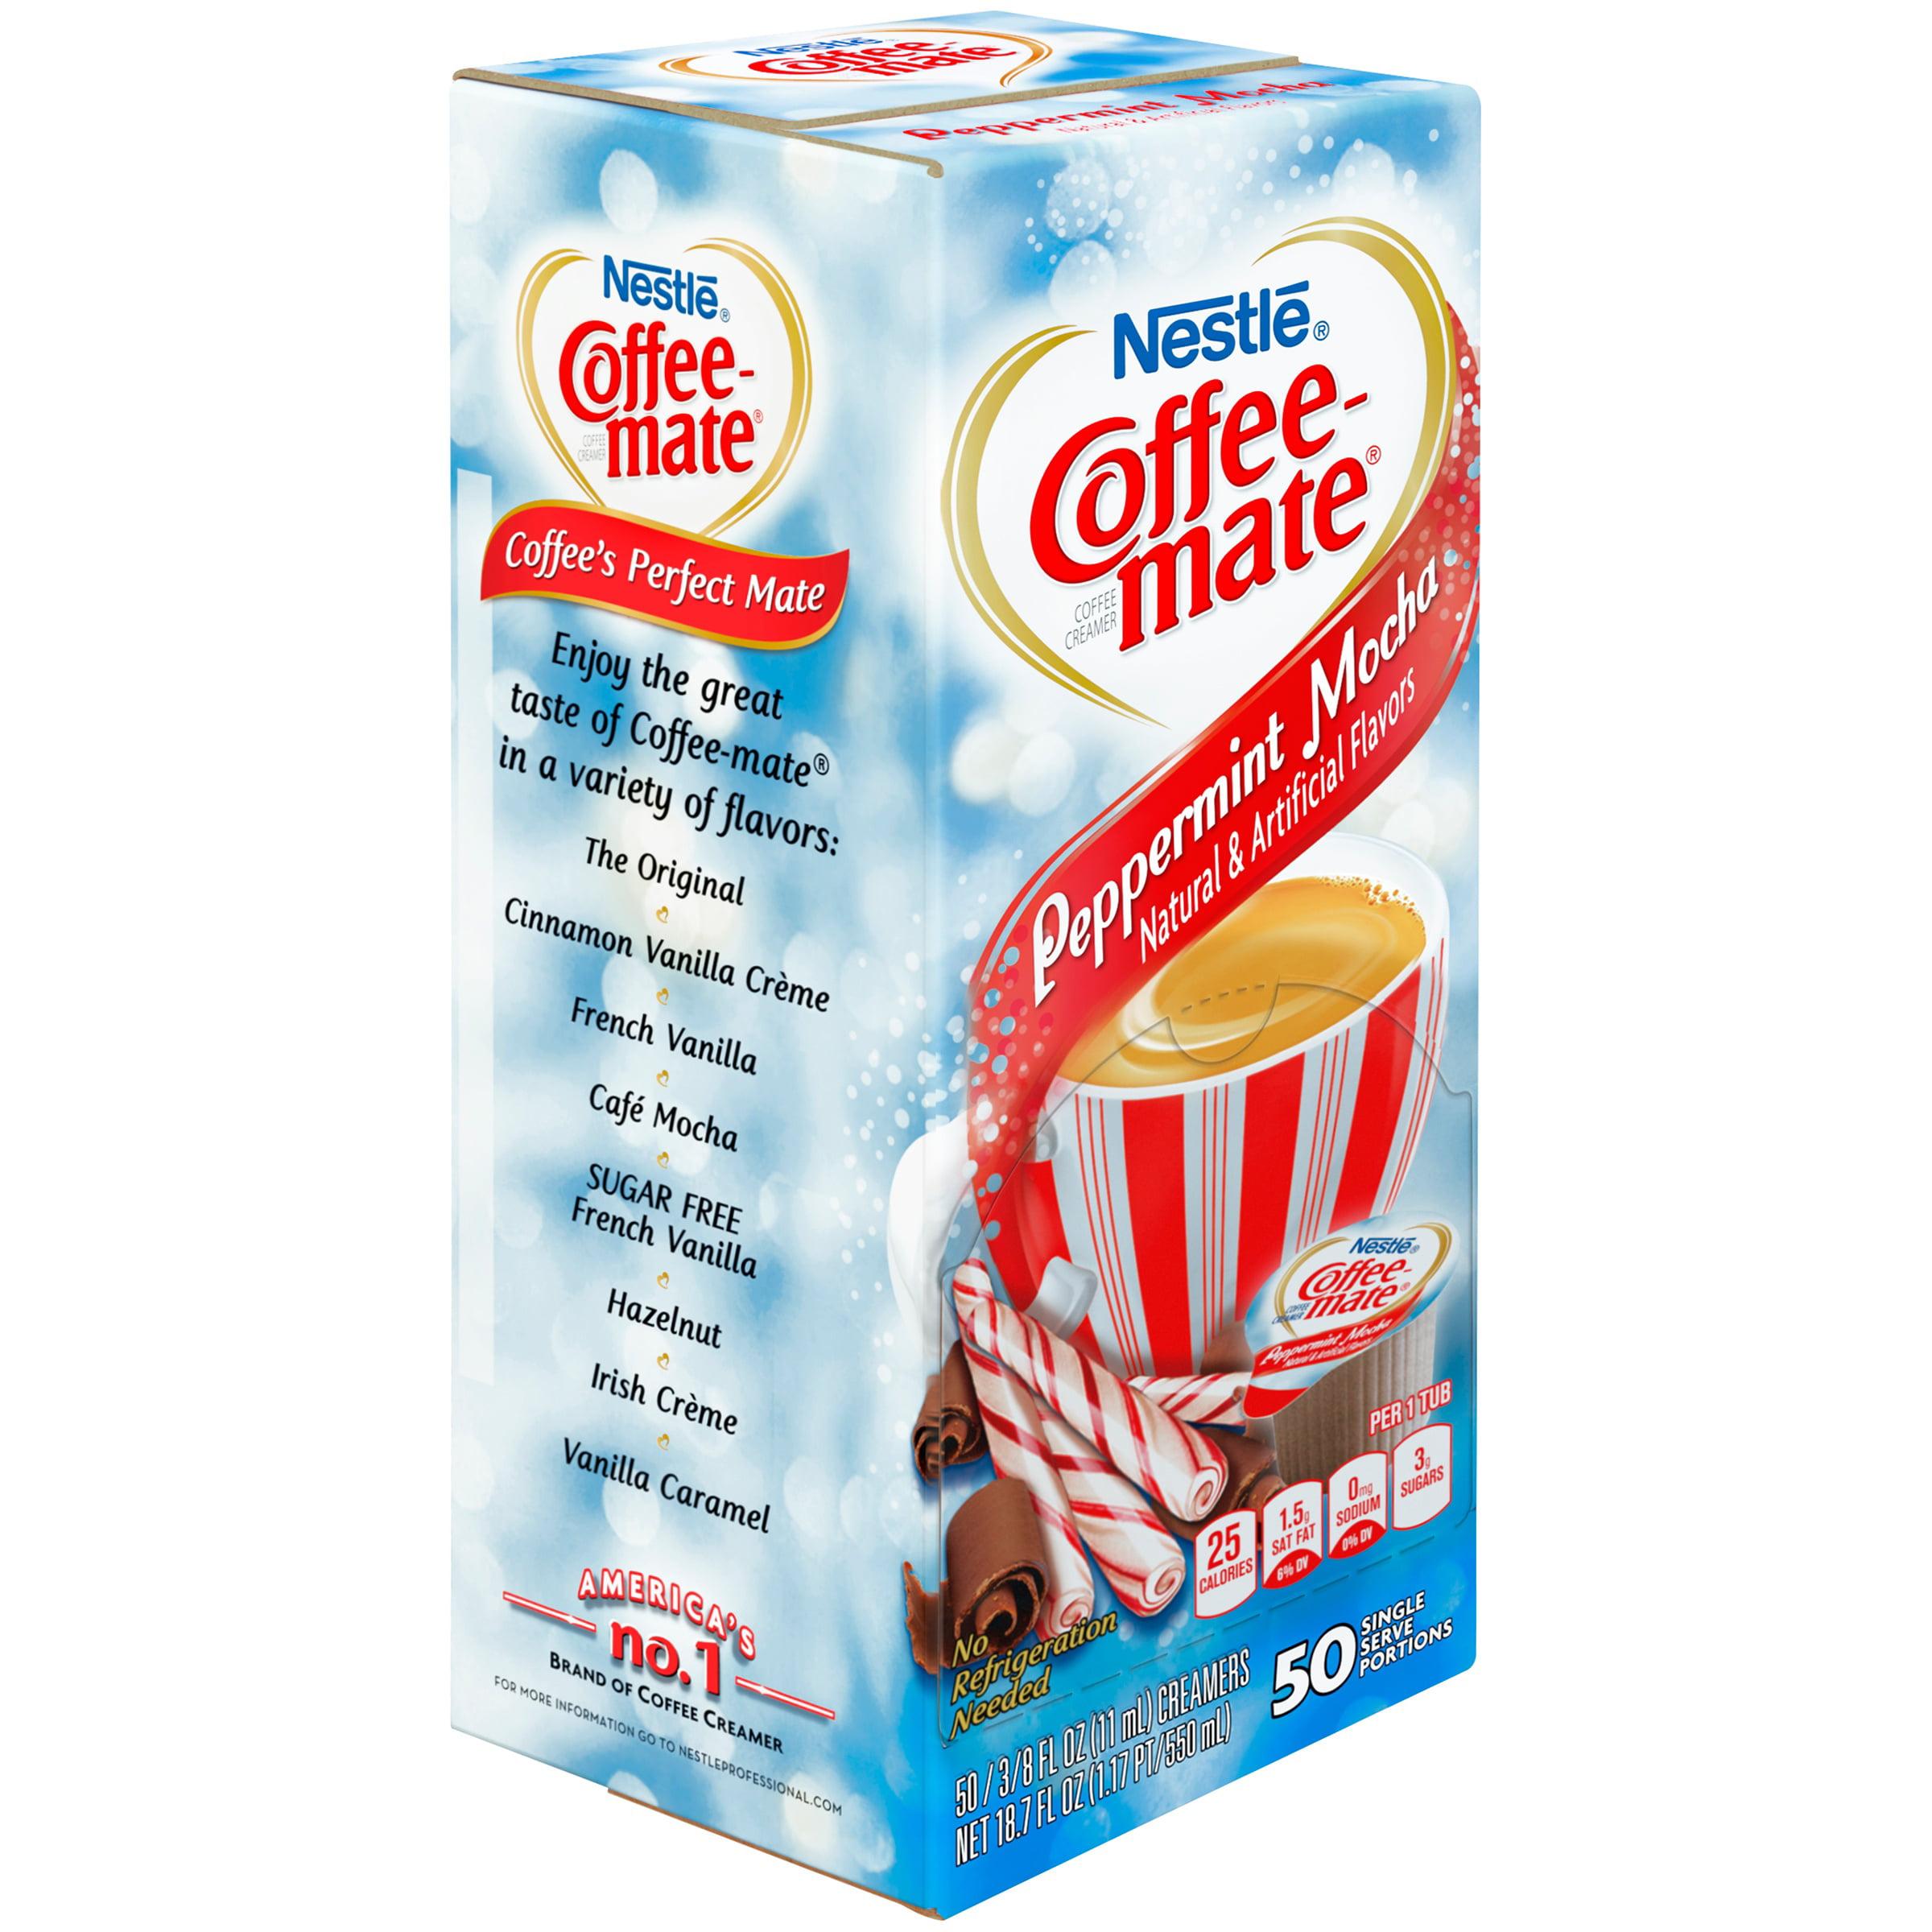 Nestlé Coffee-mate Peppermint Mocha Liquid Coffee Creamer ...